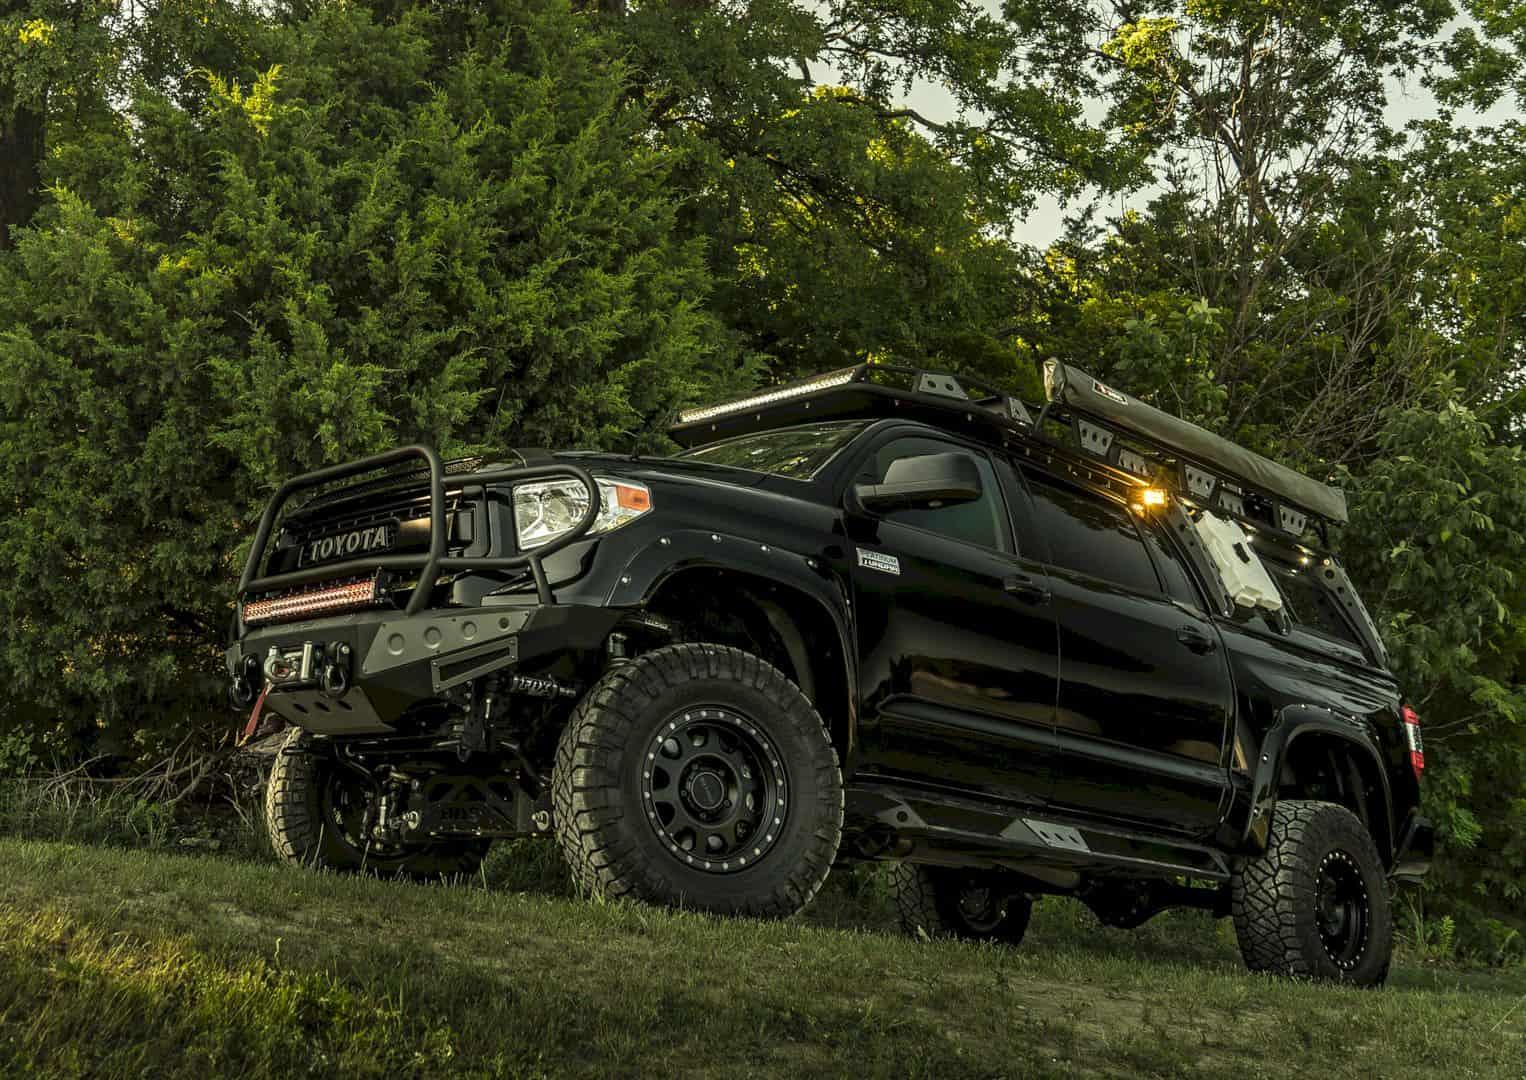 Toyota X Kevin Costner Tundra Platinum 4